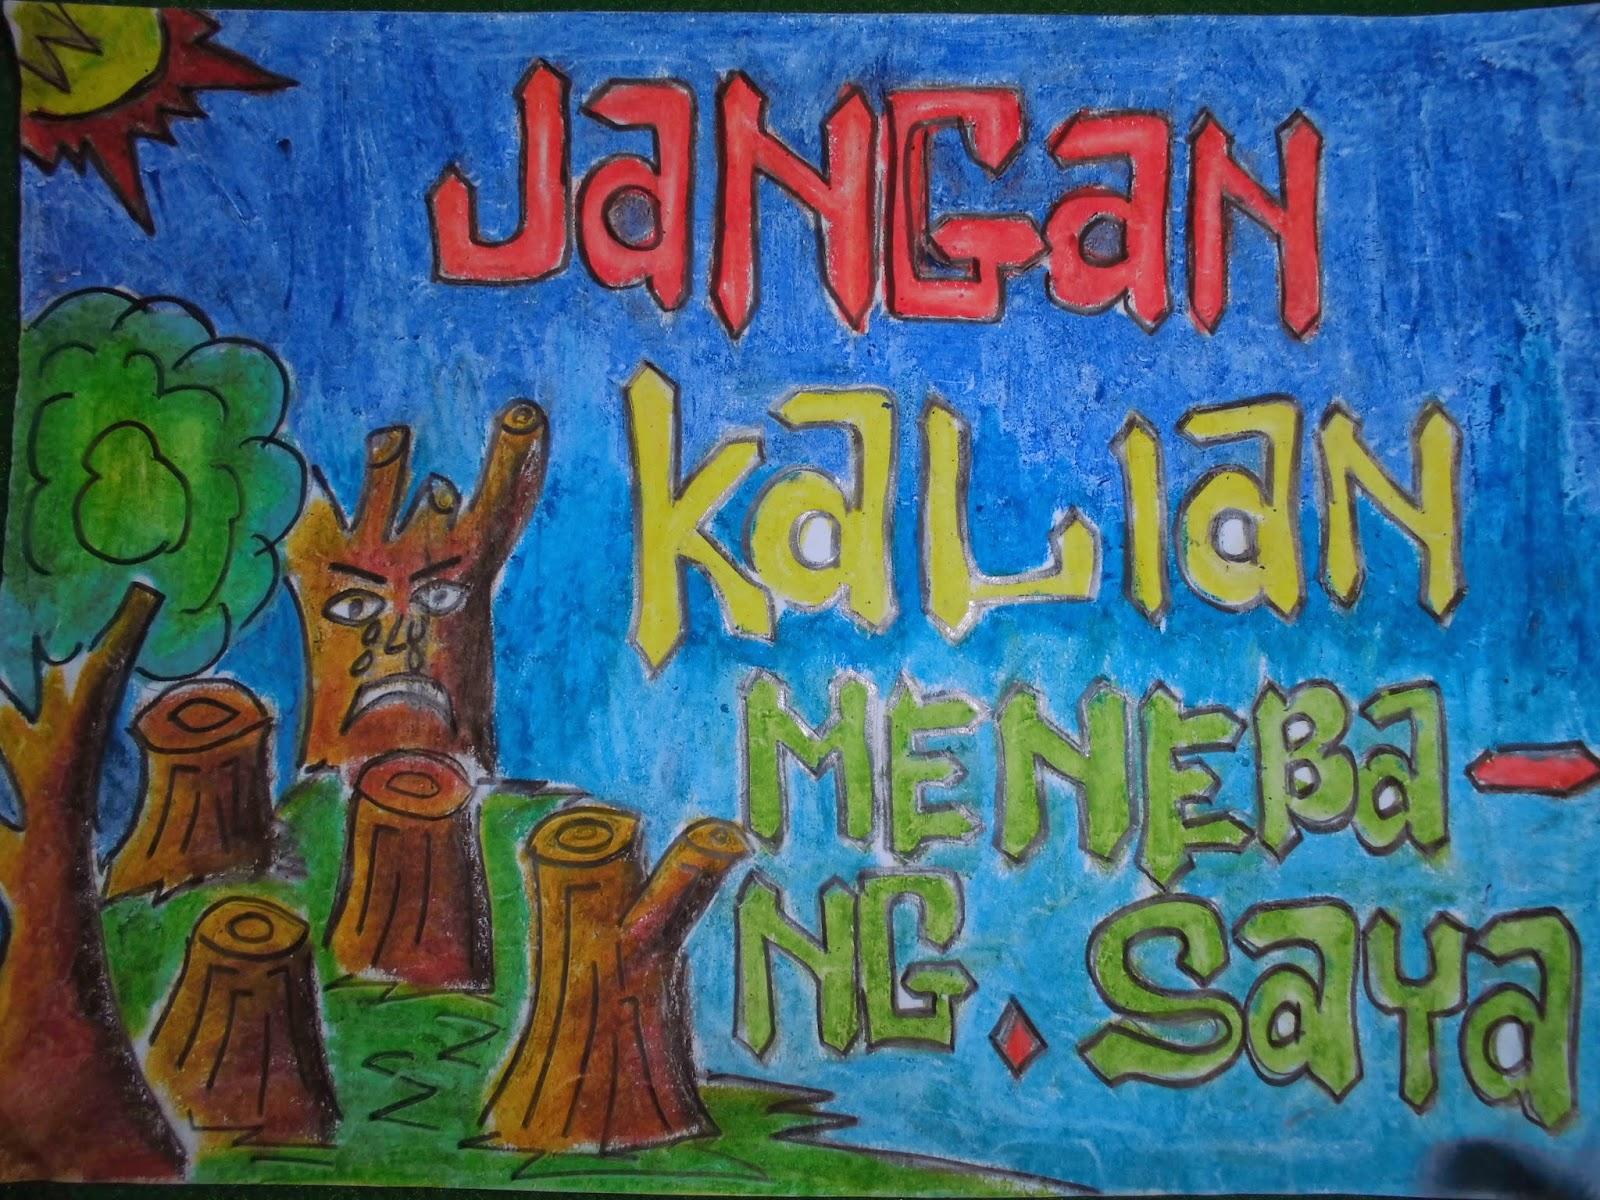 Kalimat Slogan Pendidikan Contoh Slogan Pendidikan Beserta Gambarnya 2016 Kumpulan Slogan Siswa Kelas 8h Pendidikan Bahasa Sastra Indonesia